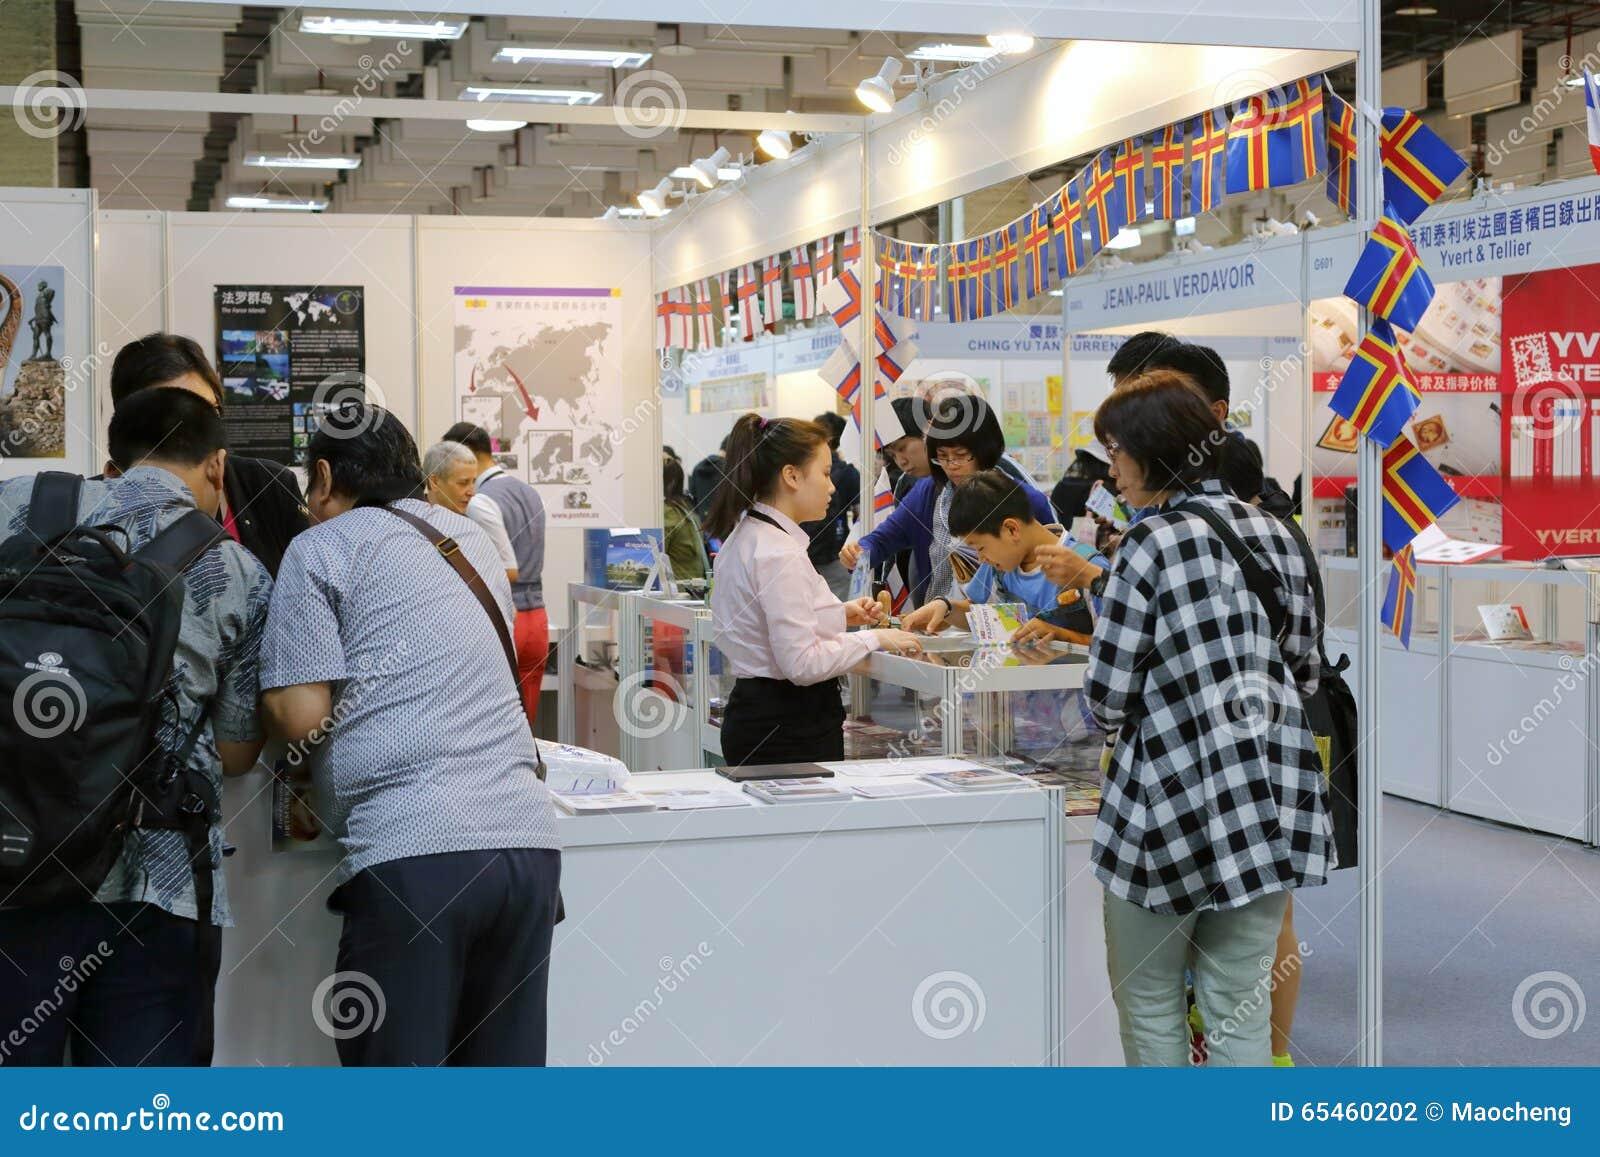 Taipei Residents Visit The Sta...